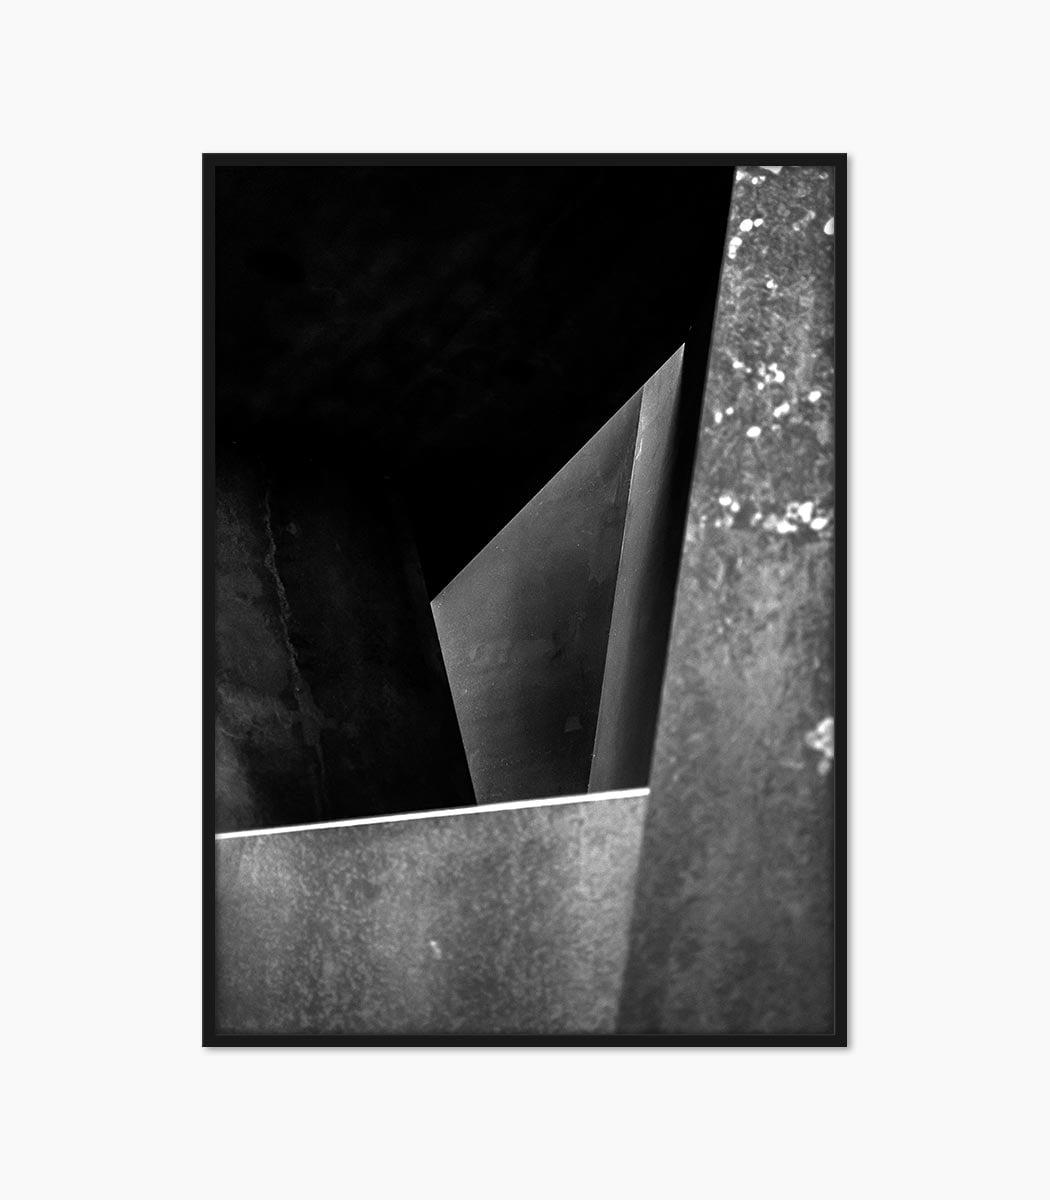 print fotografie abstract creata si printata la calitate superioara numai pe www.artwall.ro